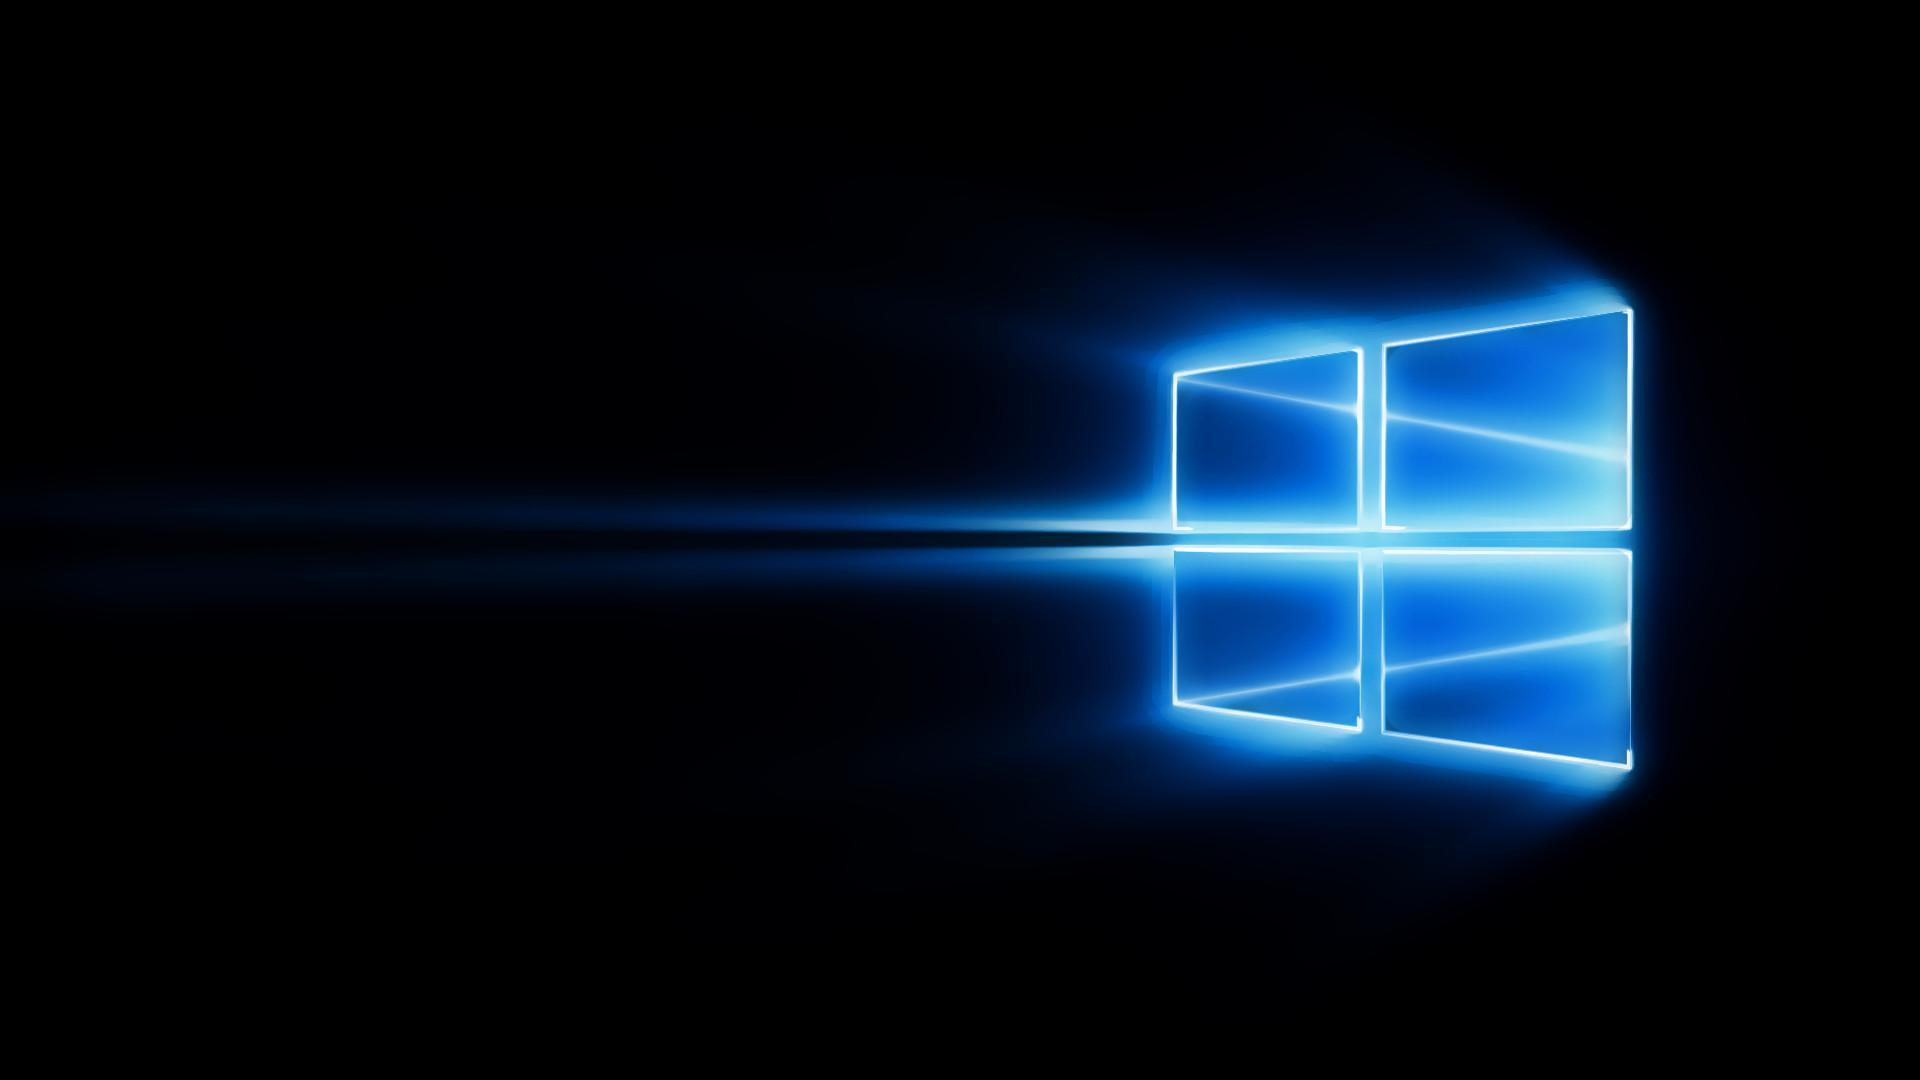 Windows 10 Hero Wallpapers - Wallpaper Cave